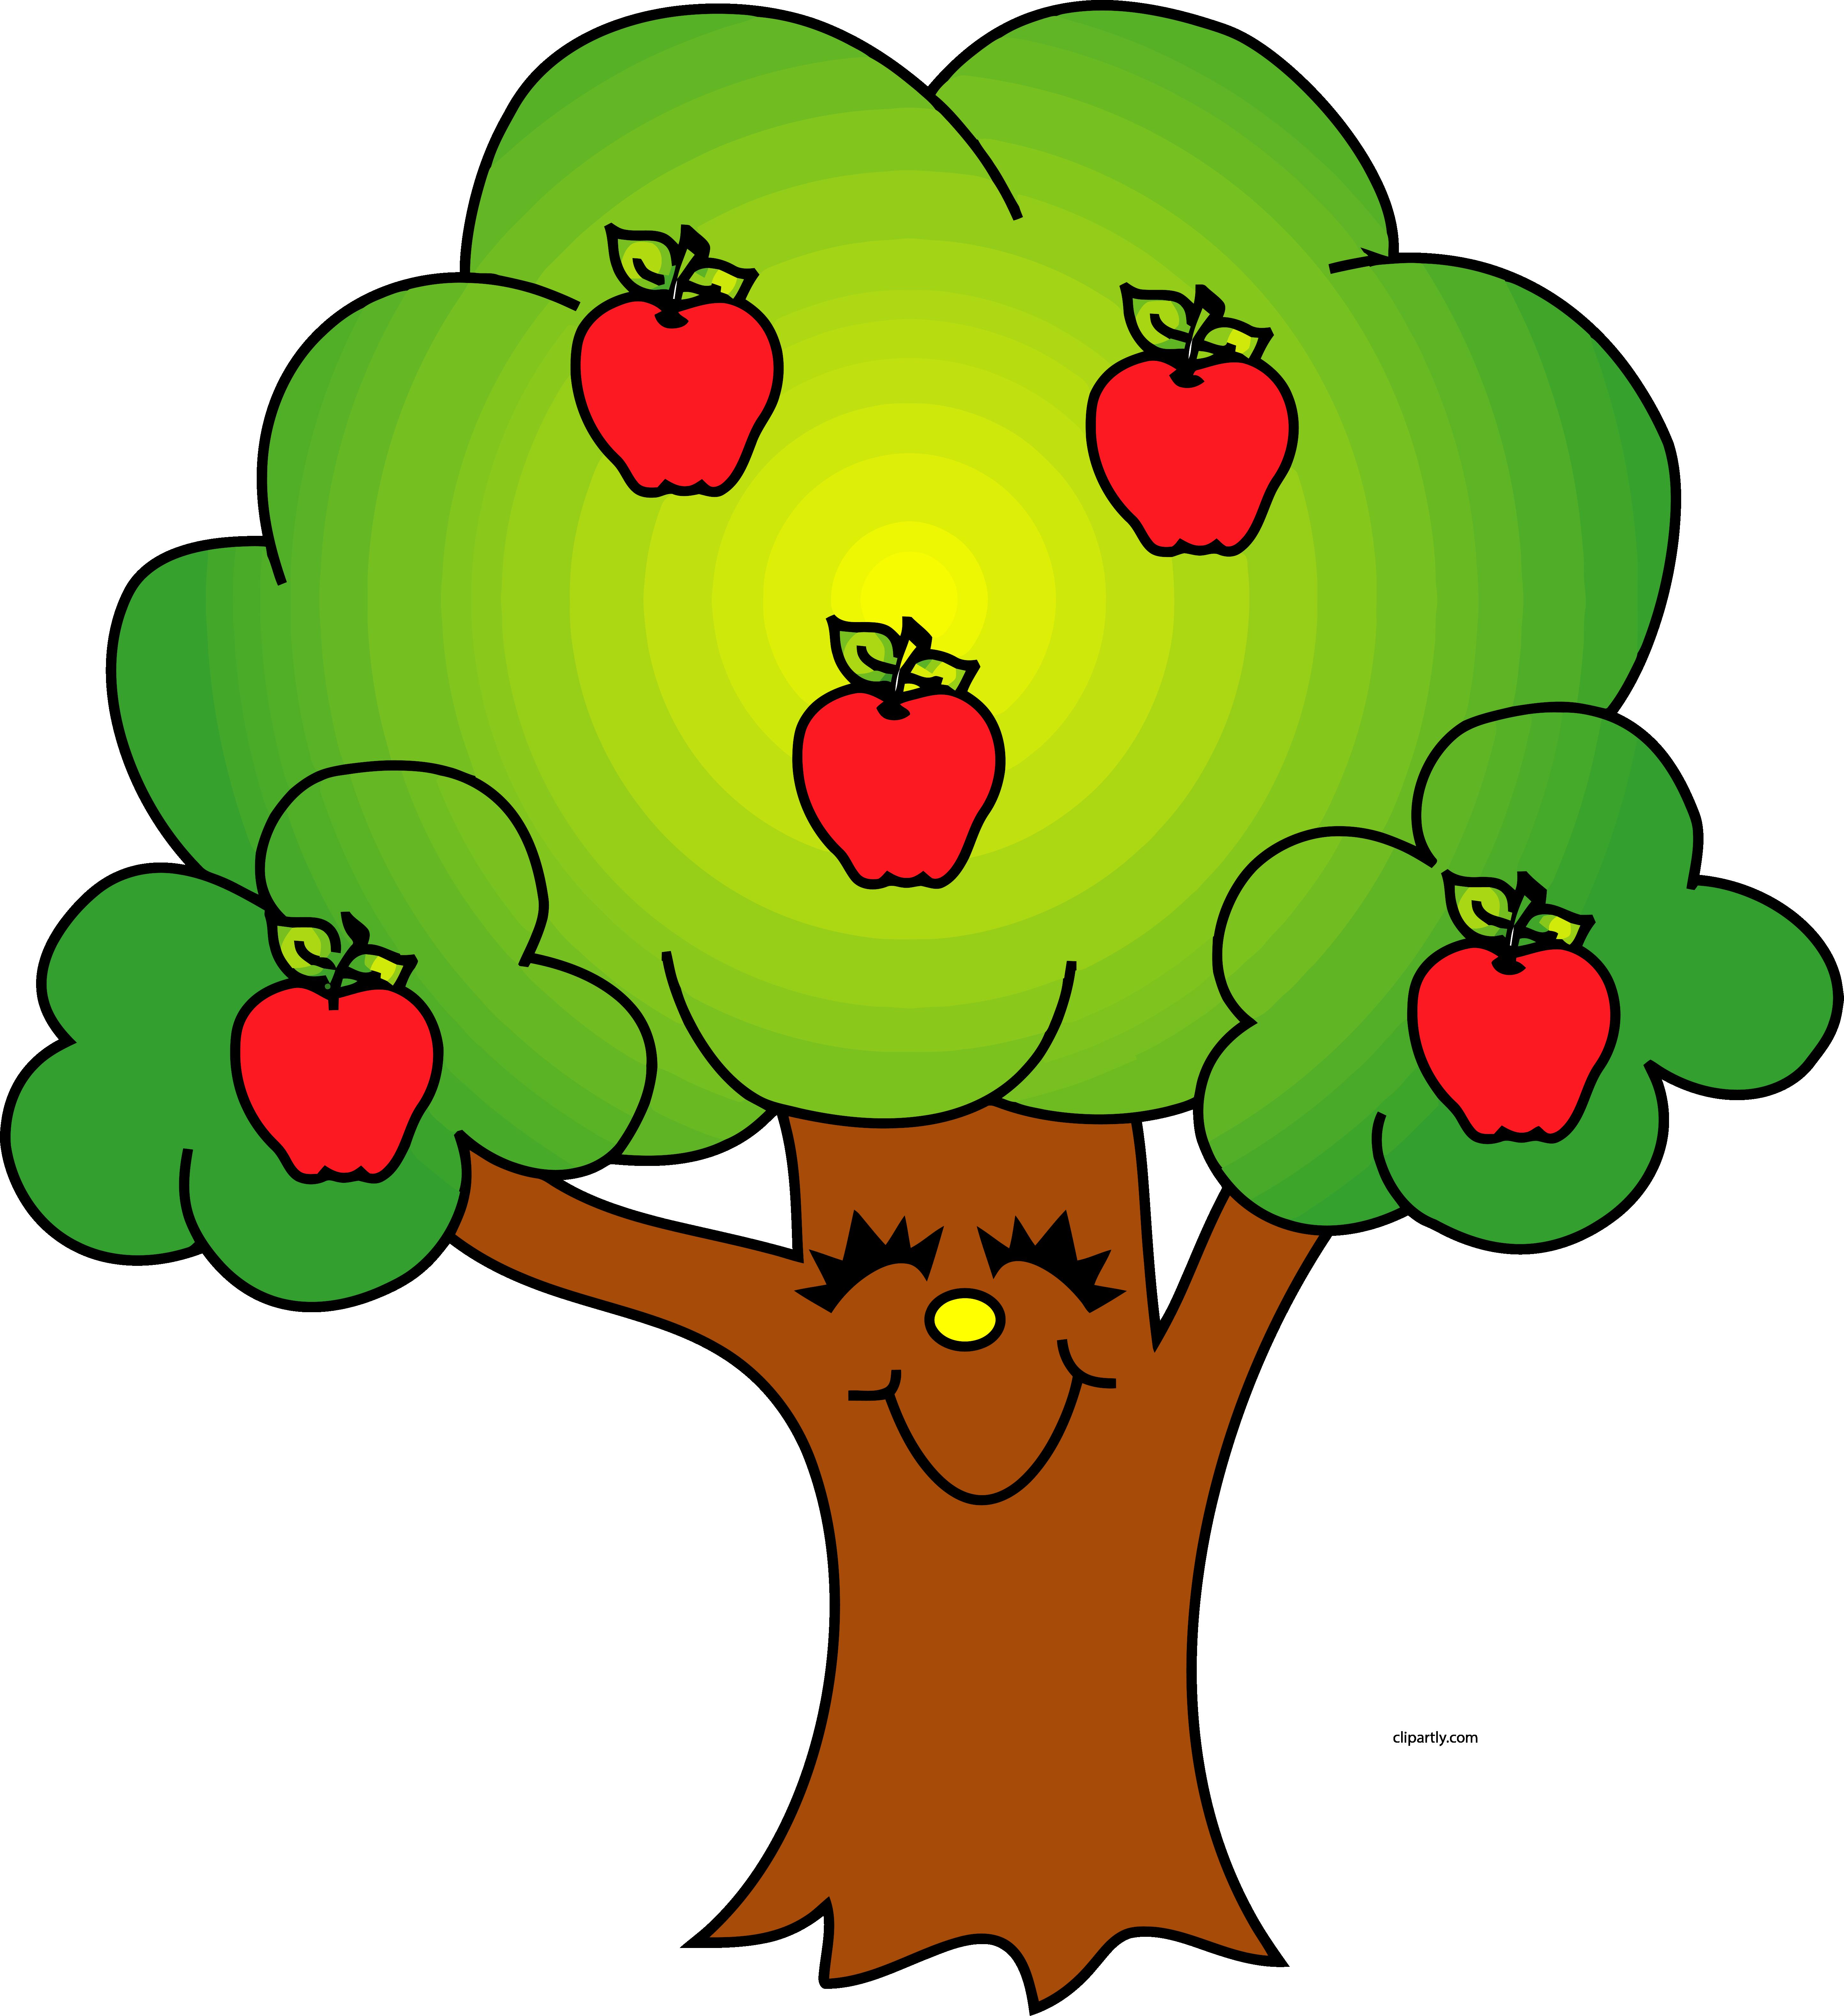 Transparent tree clip art - Trees Image Of Tree Clipart 8 Cool Apple Tree Clip - Tree With Apples Clipart